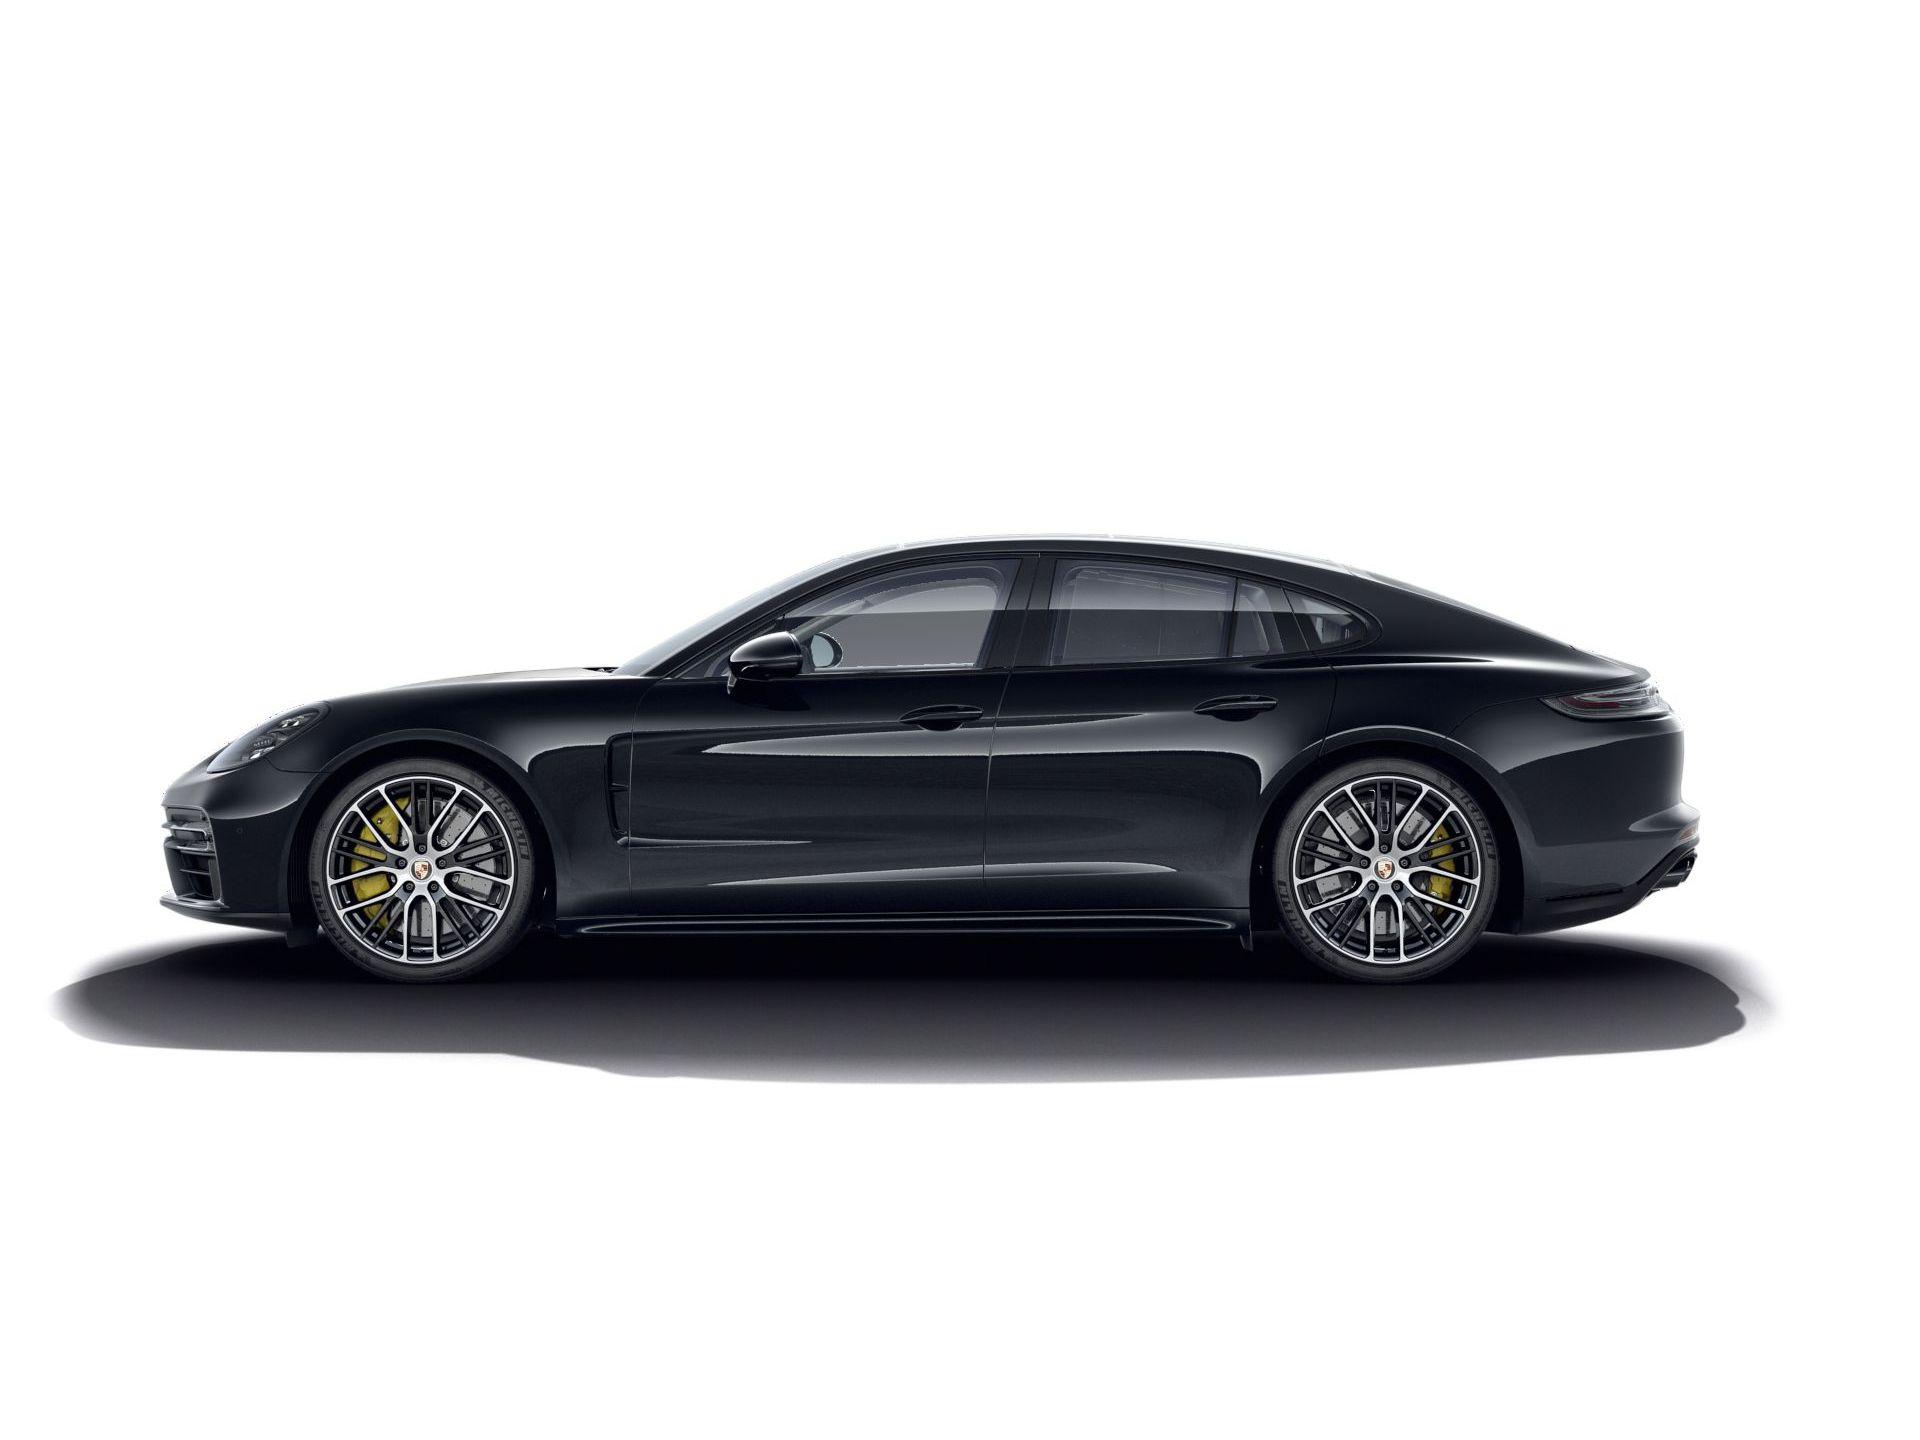 2022 Porsche Panamera Turbo S – 2